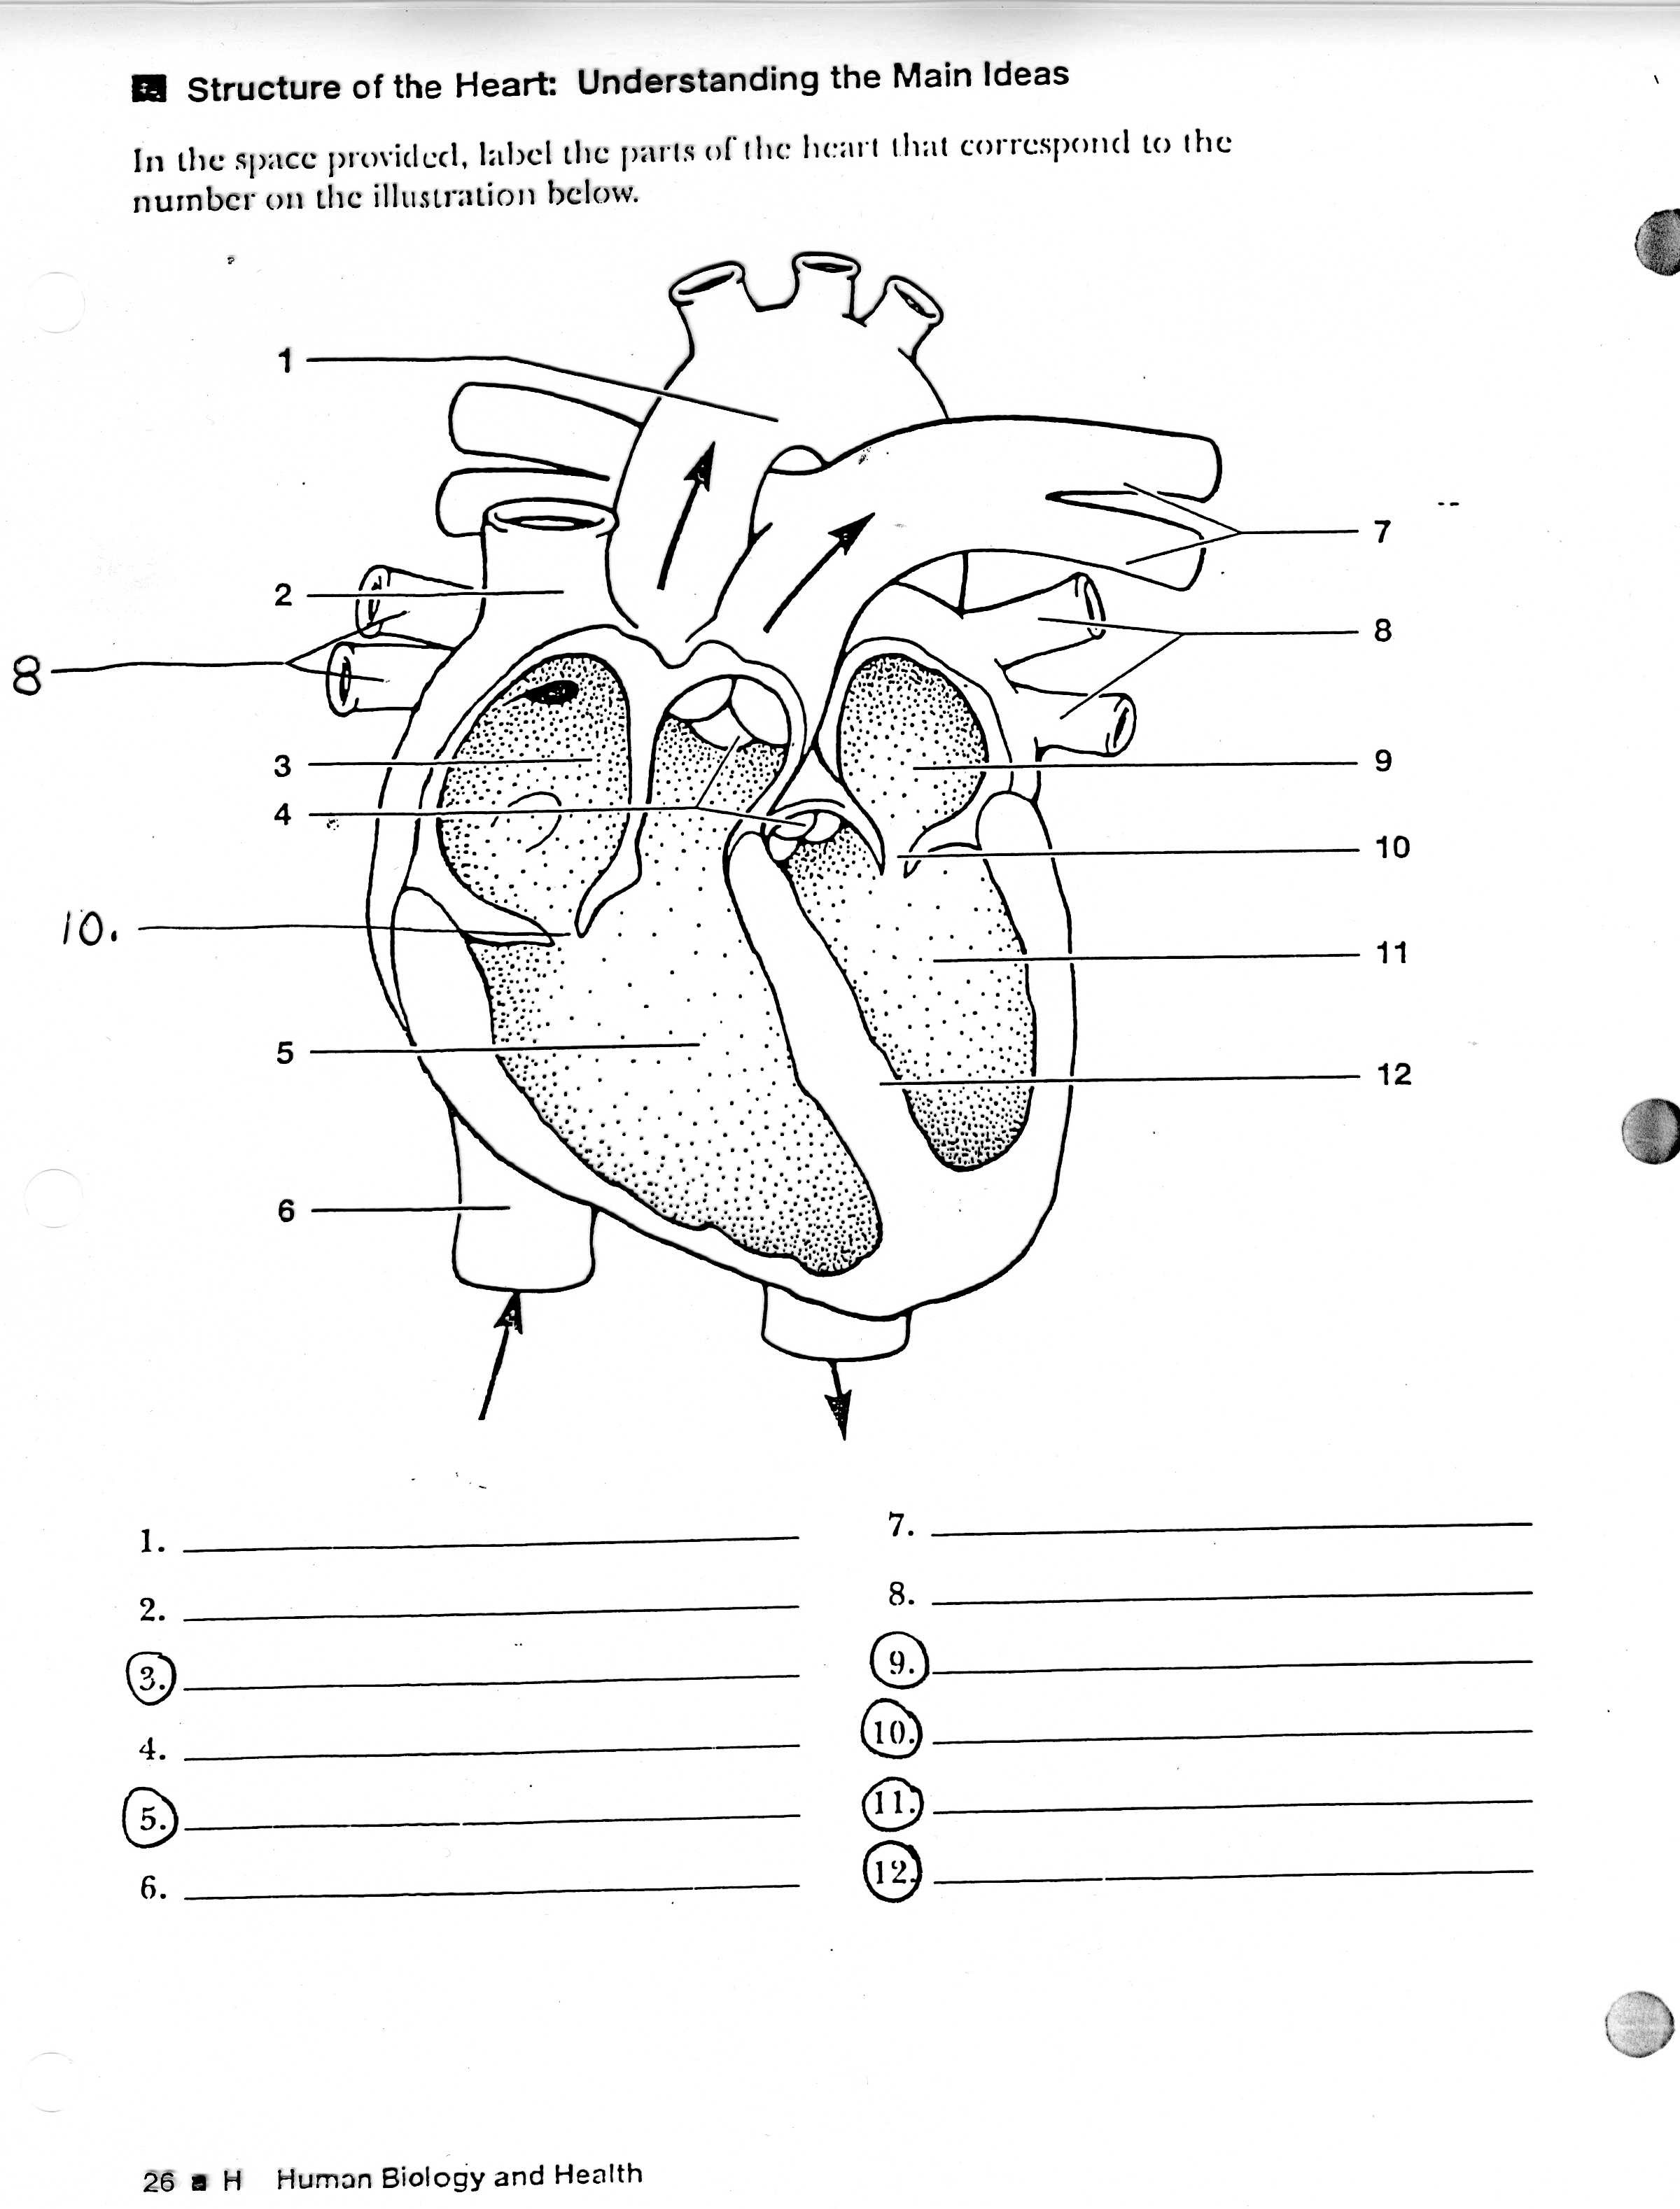 Heart Diagram Worksheet - Davezan